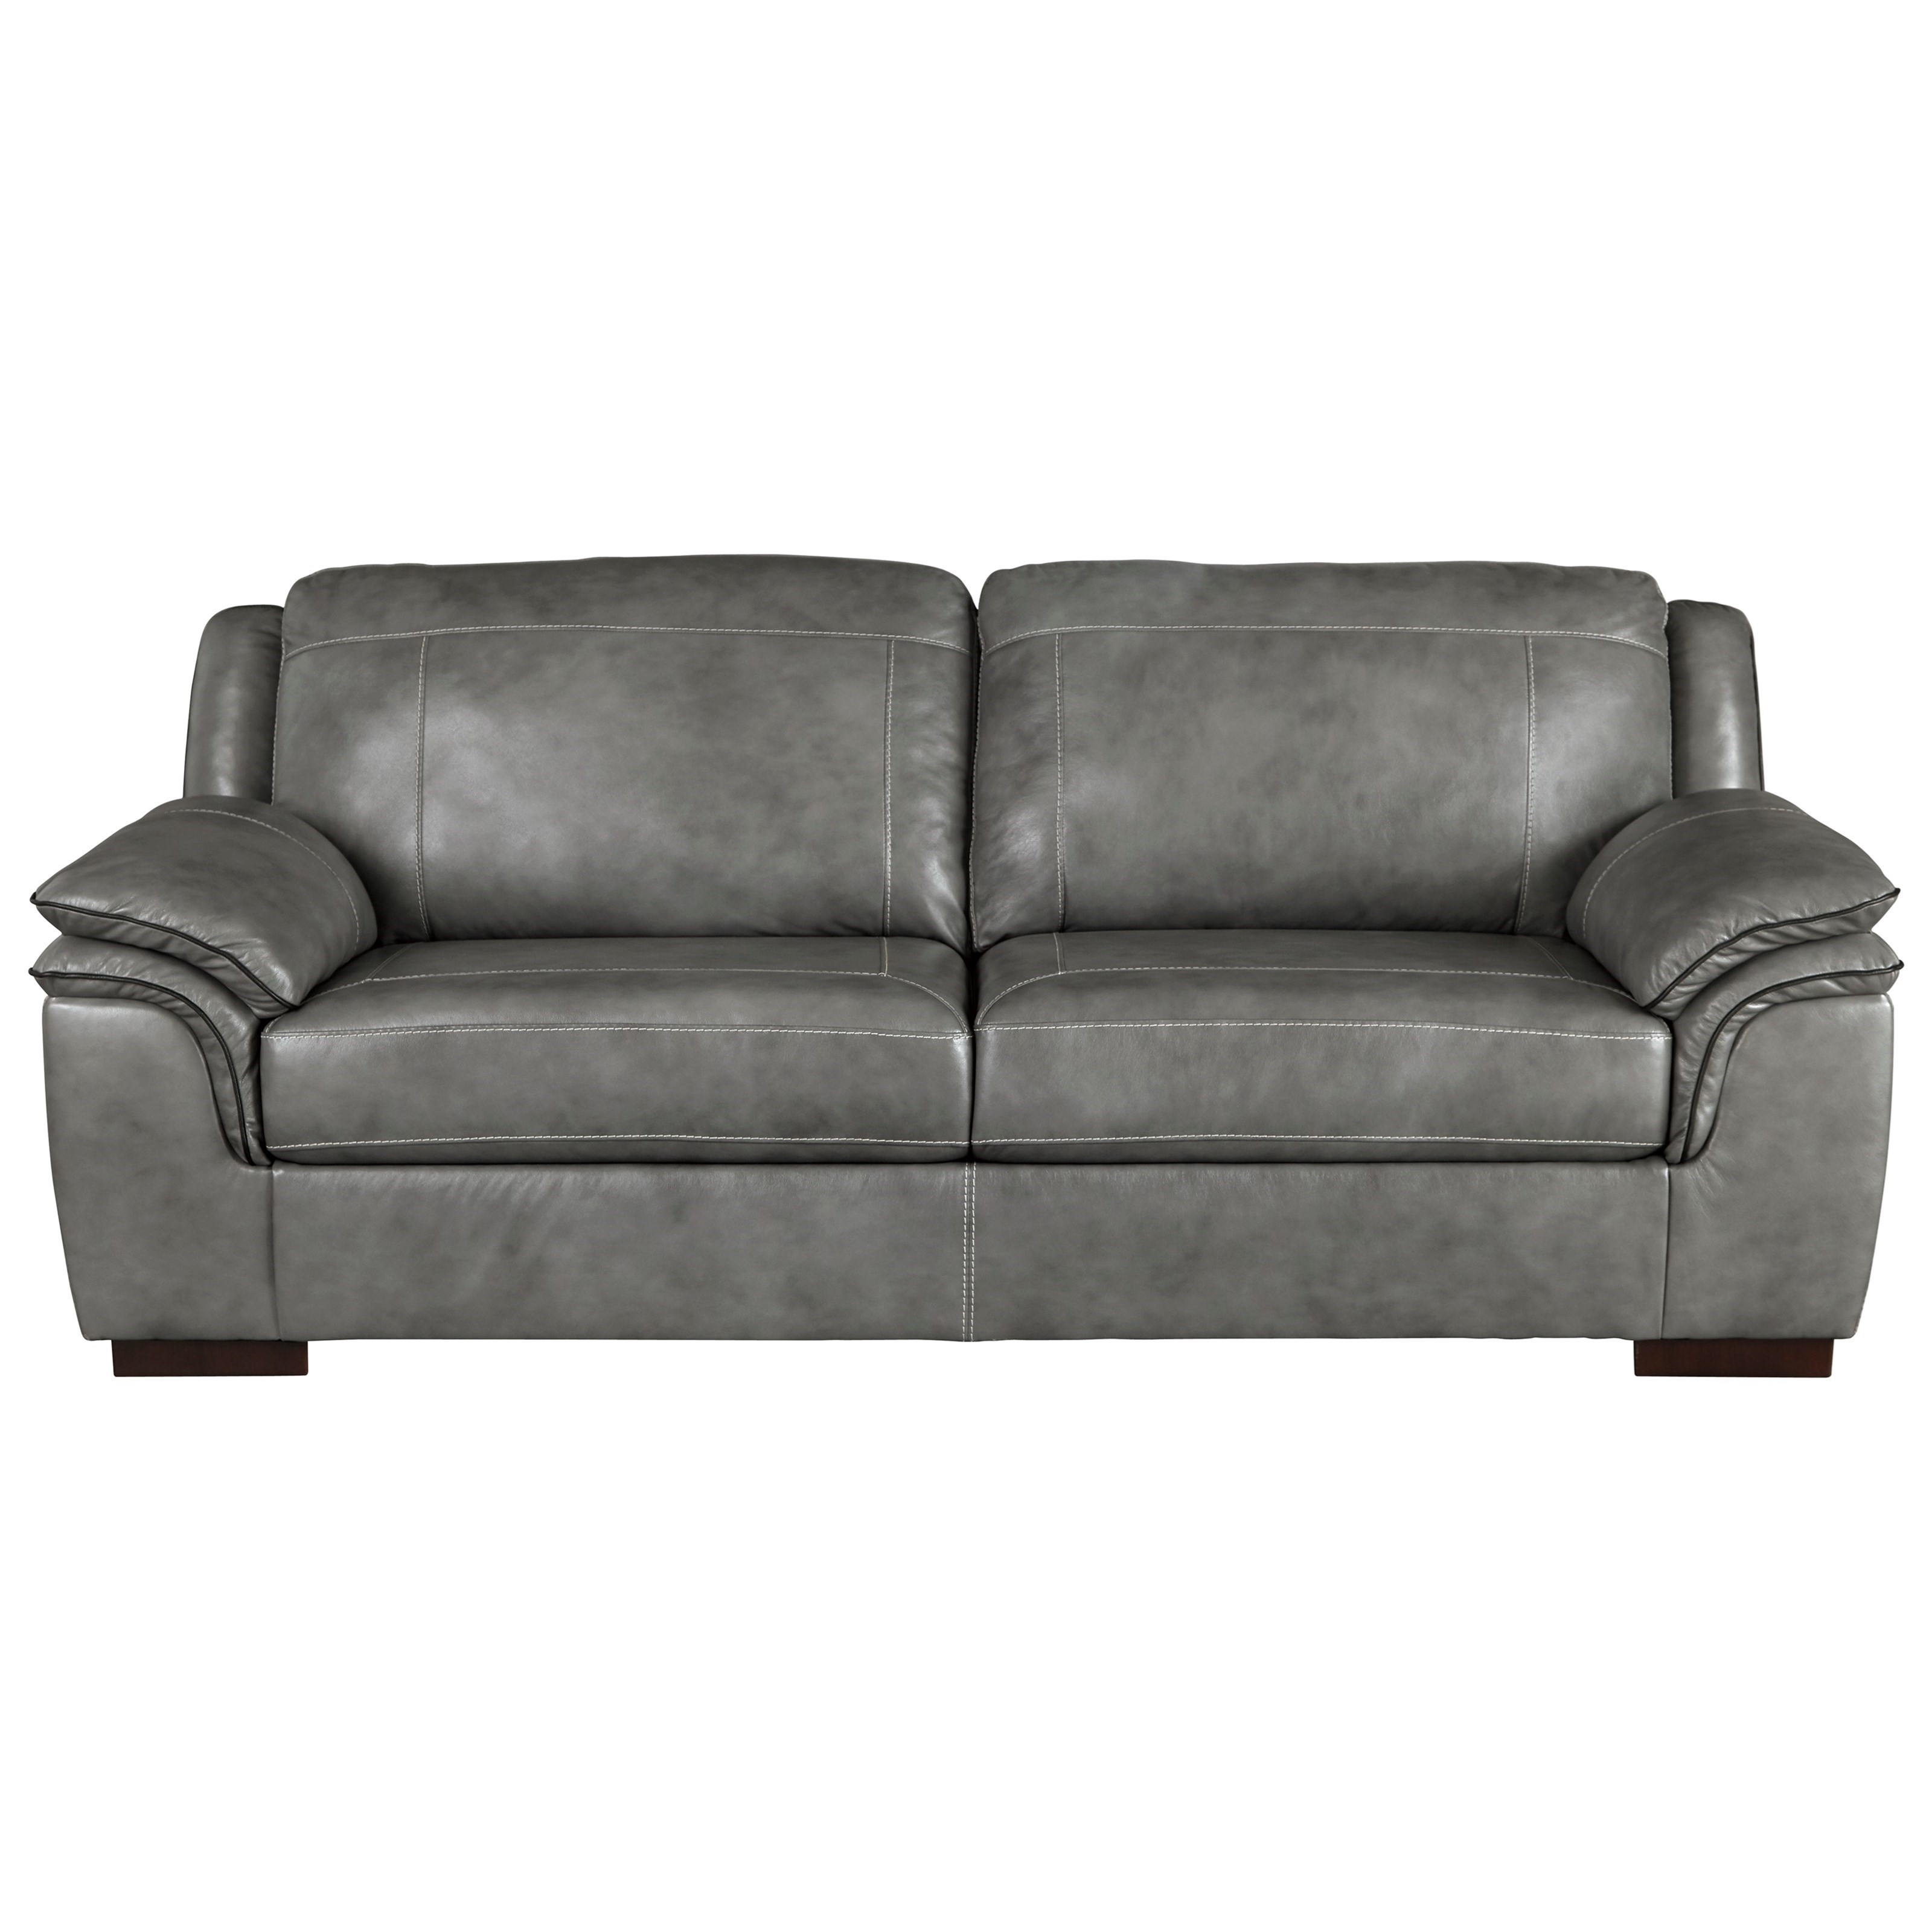 Signature Design by Ashley Islebrook Contemporary Leather Match Sofa ...